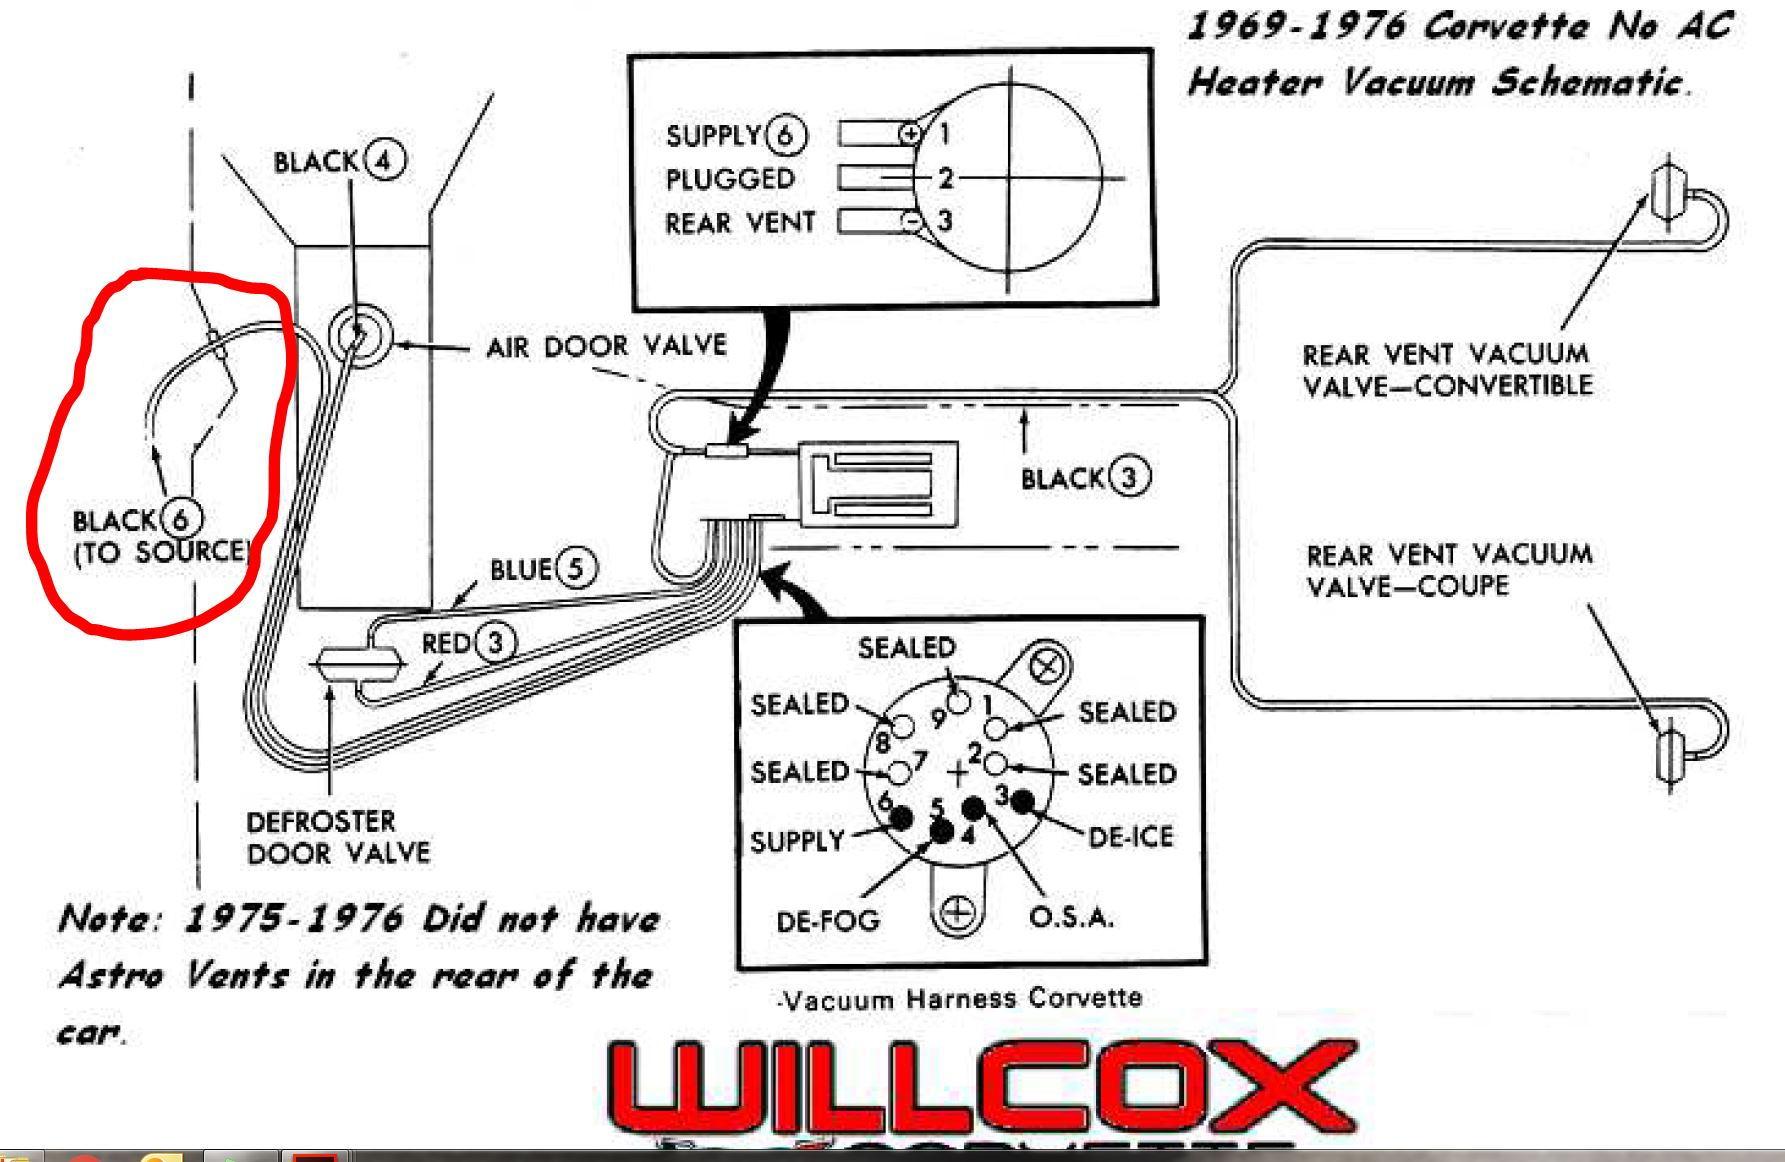 1969 - no ac, heater control vacuum source pic request